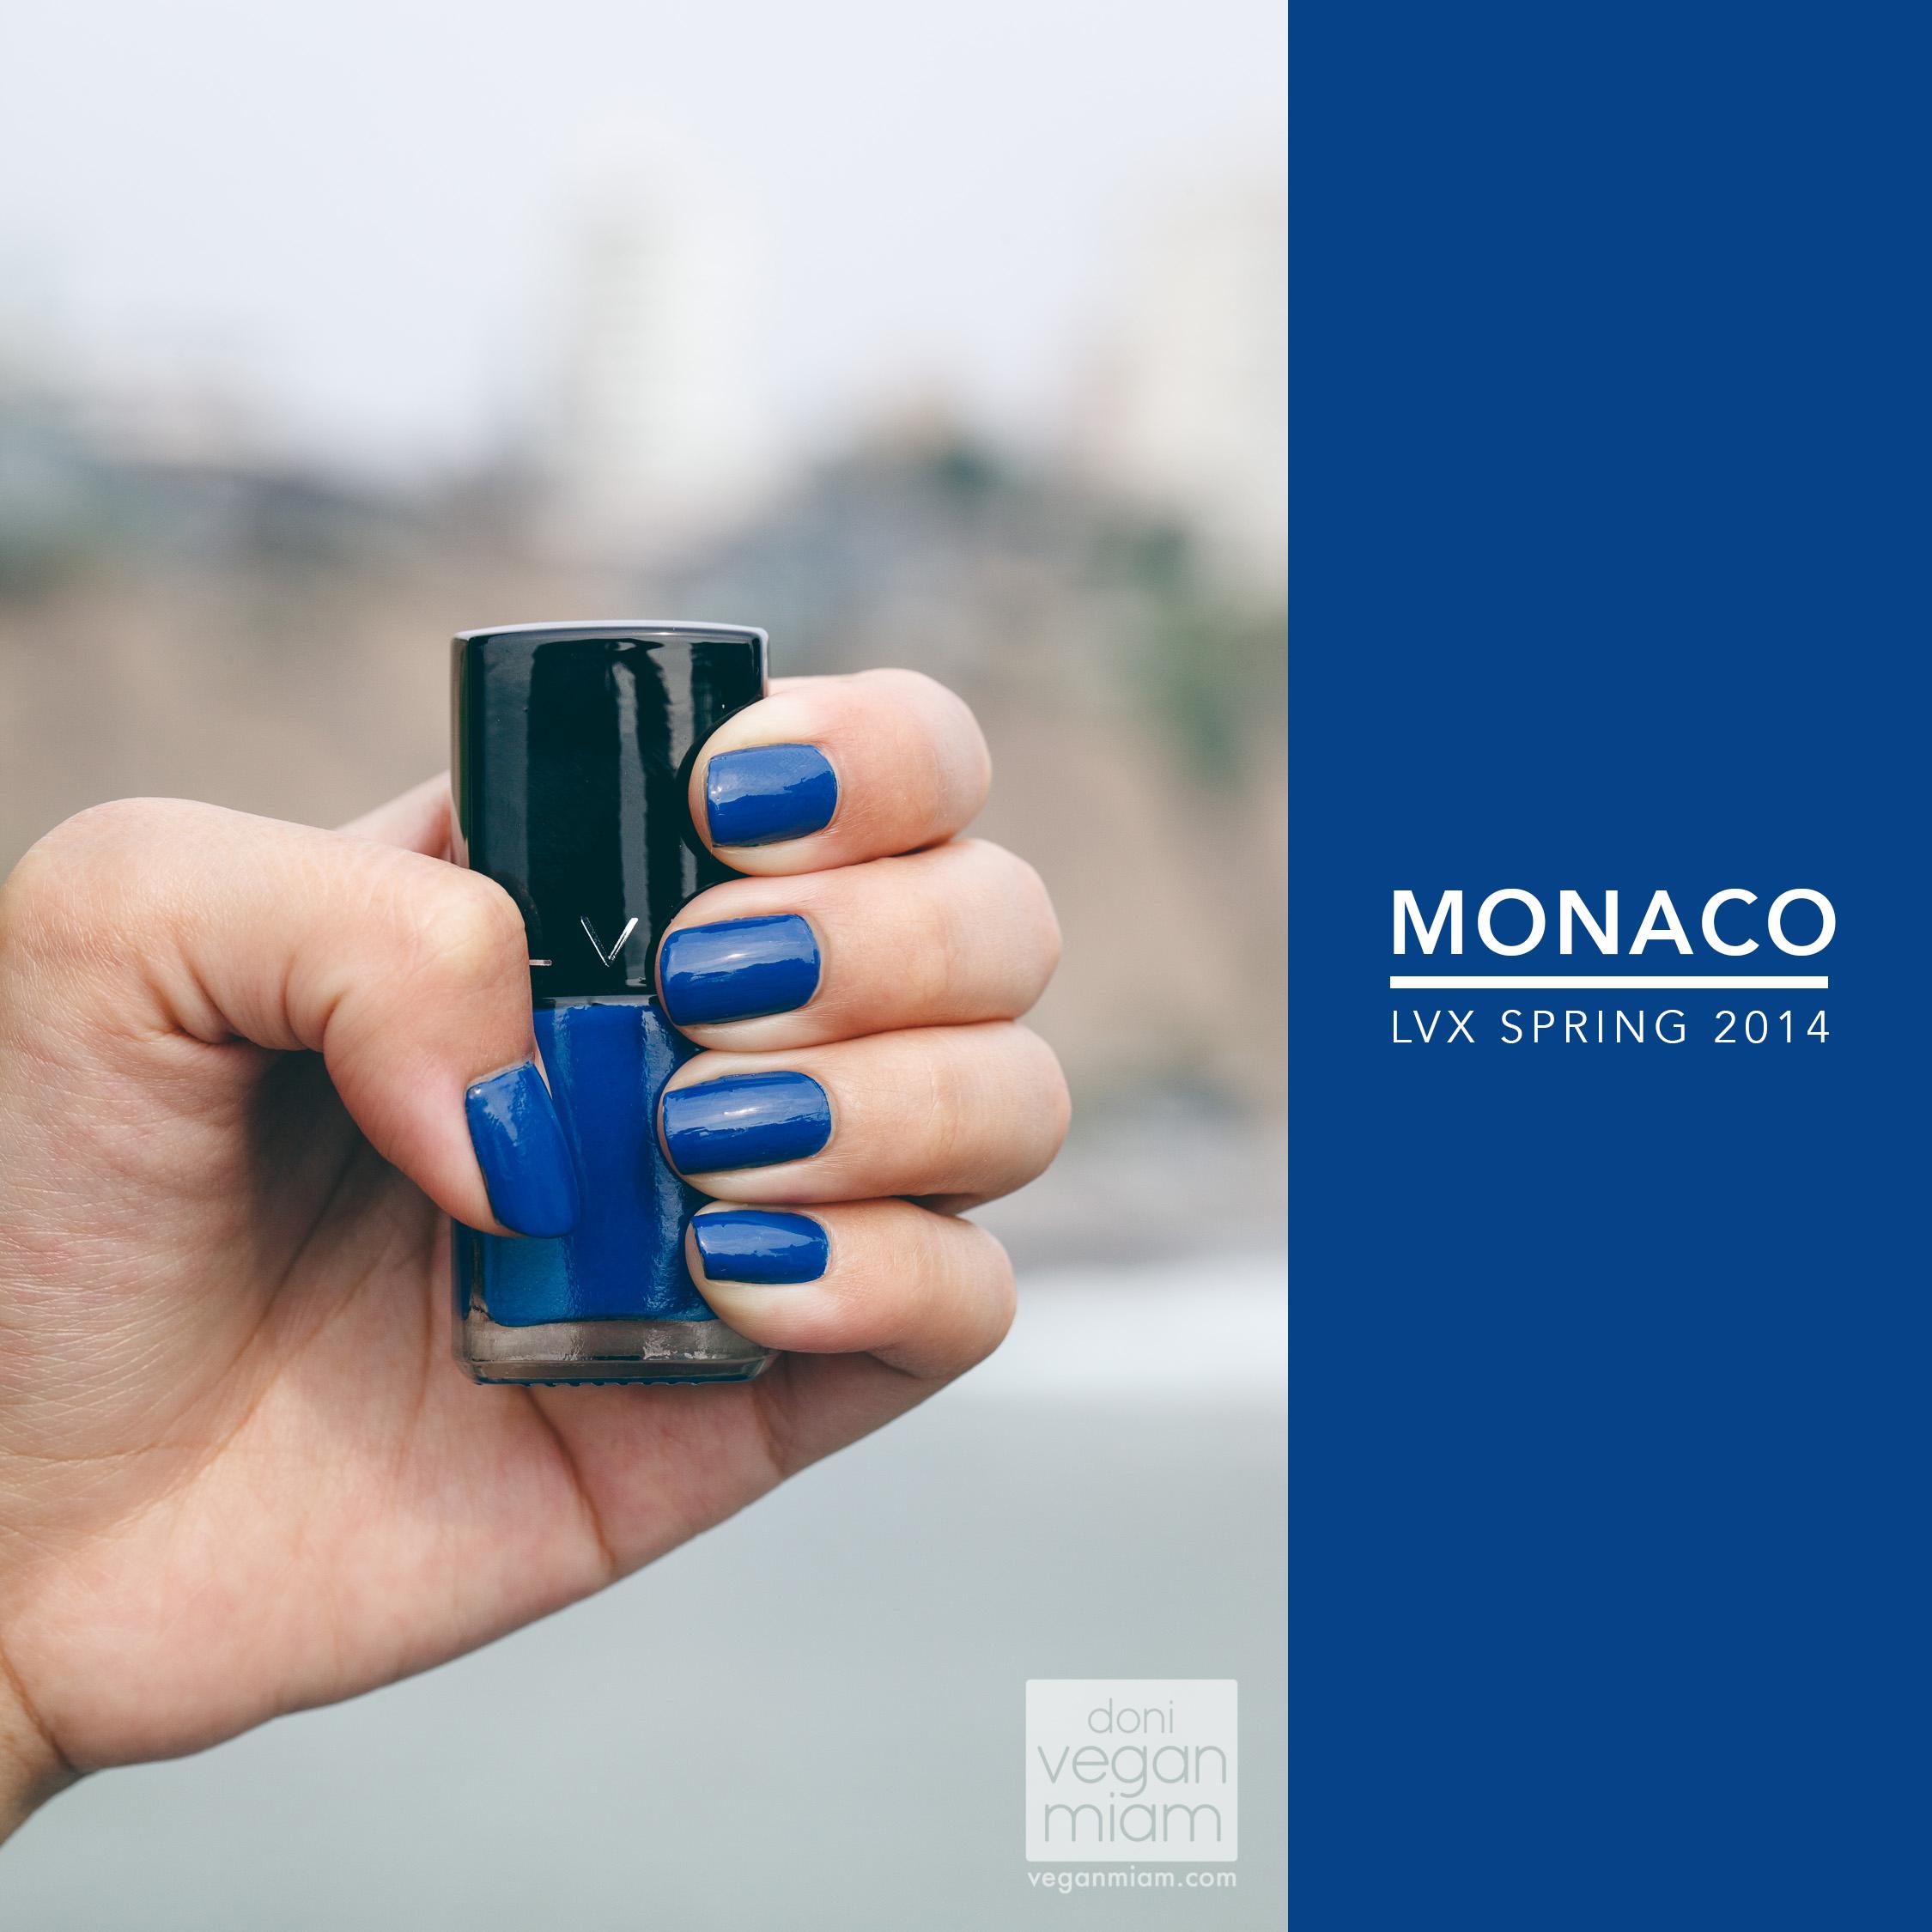 LVX Spring 2014 - Monaco